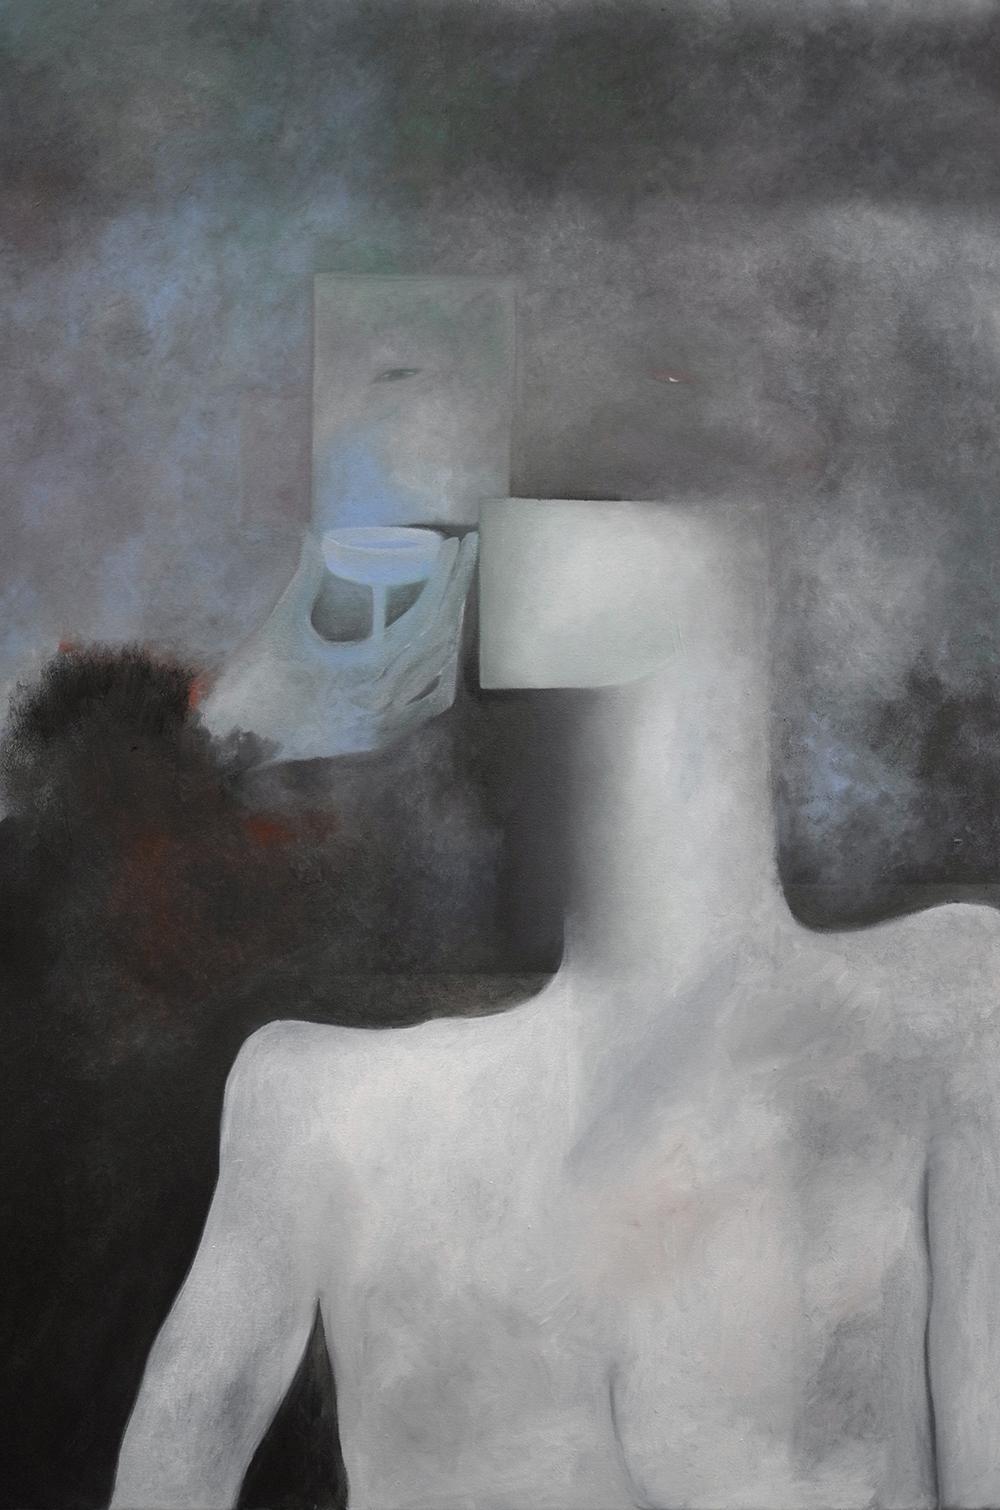 3. S. Derviz, 'Night shift', oil on canvas, 100 x 70 cm, 2019.jpg